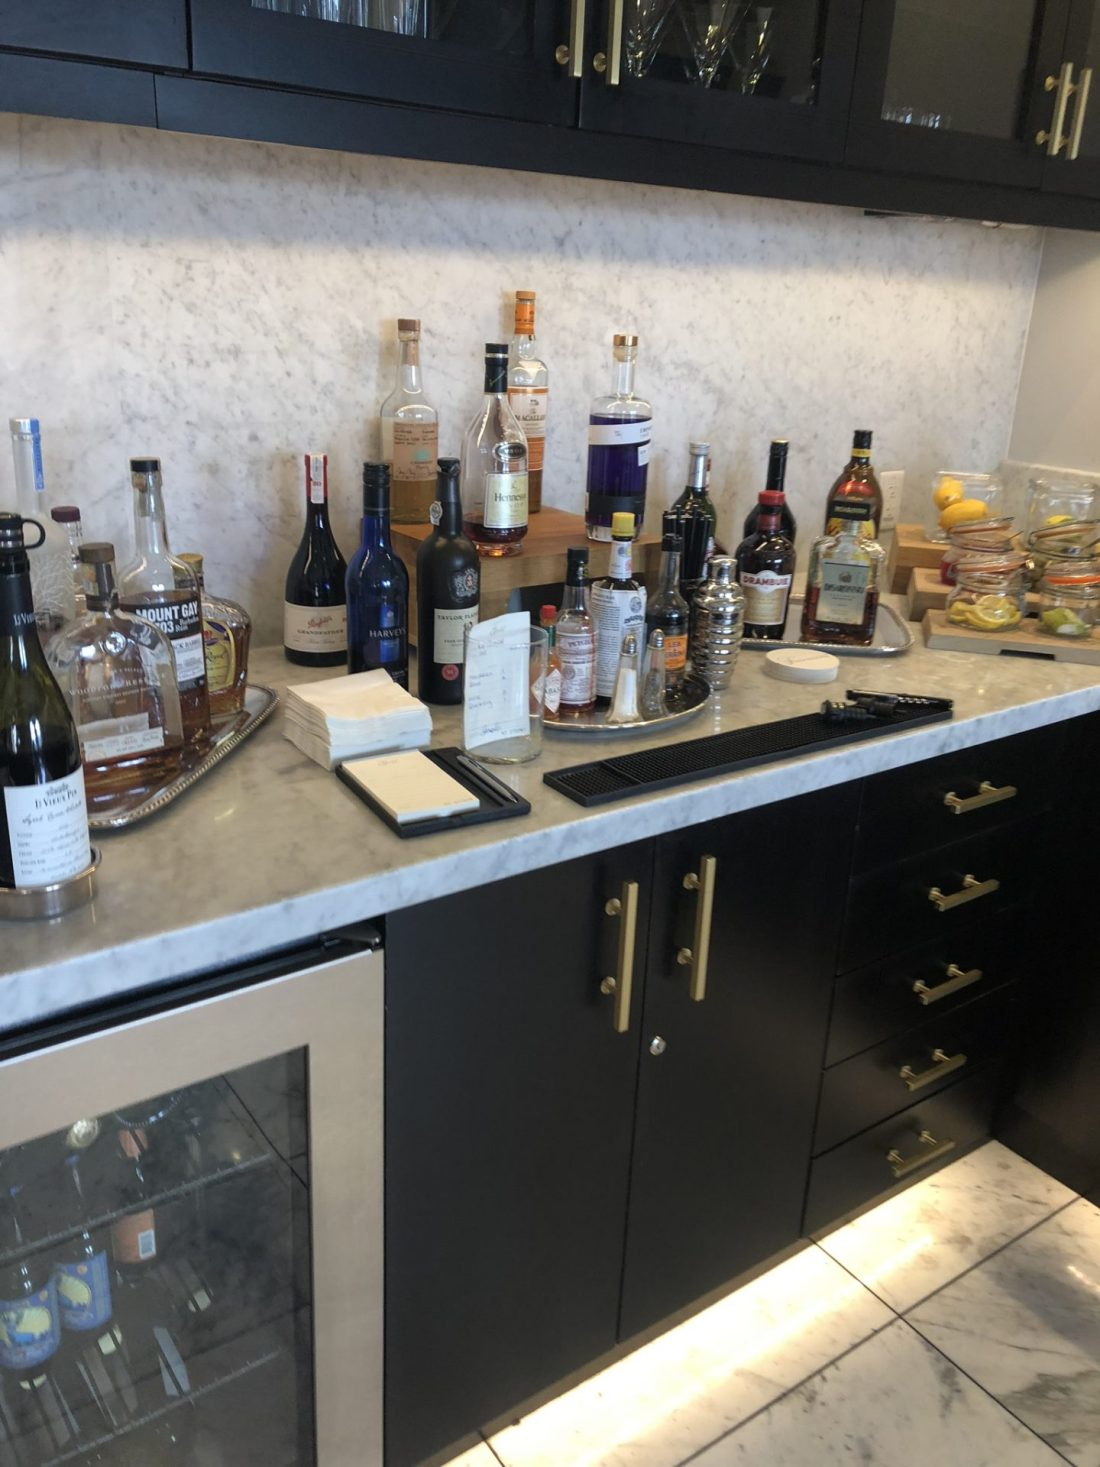 Honesty bar at the Fairmont Empress Gold Lounge